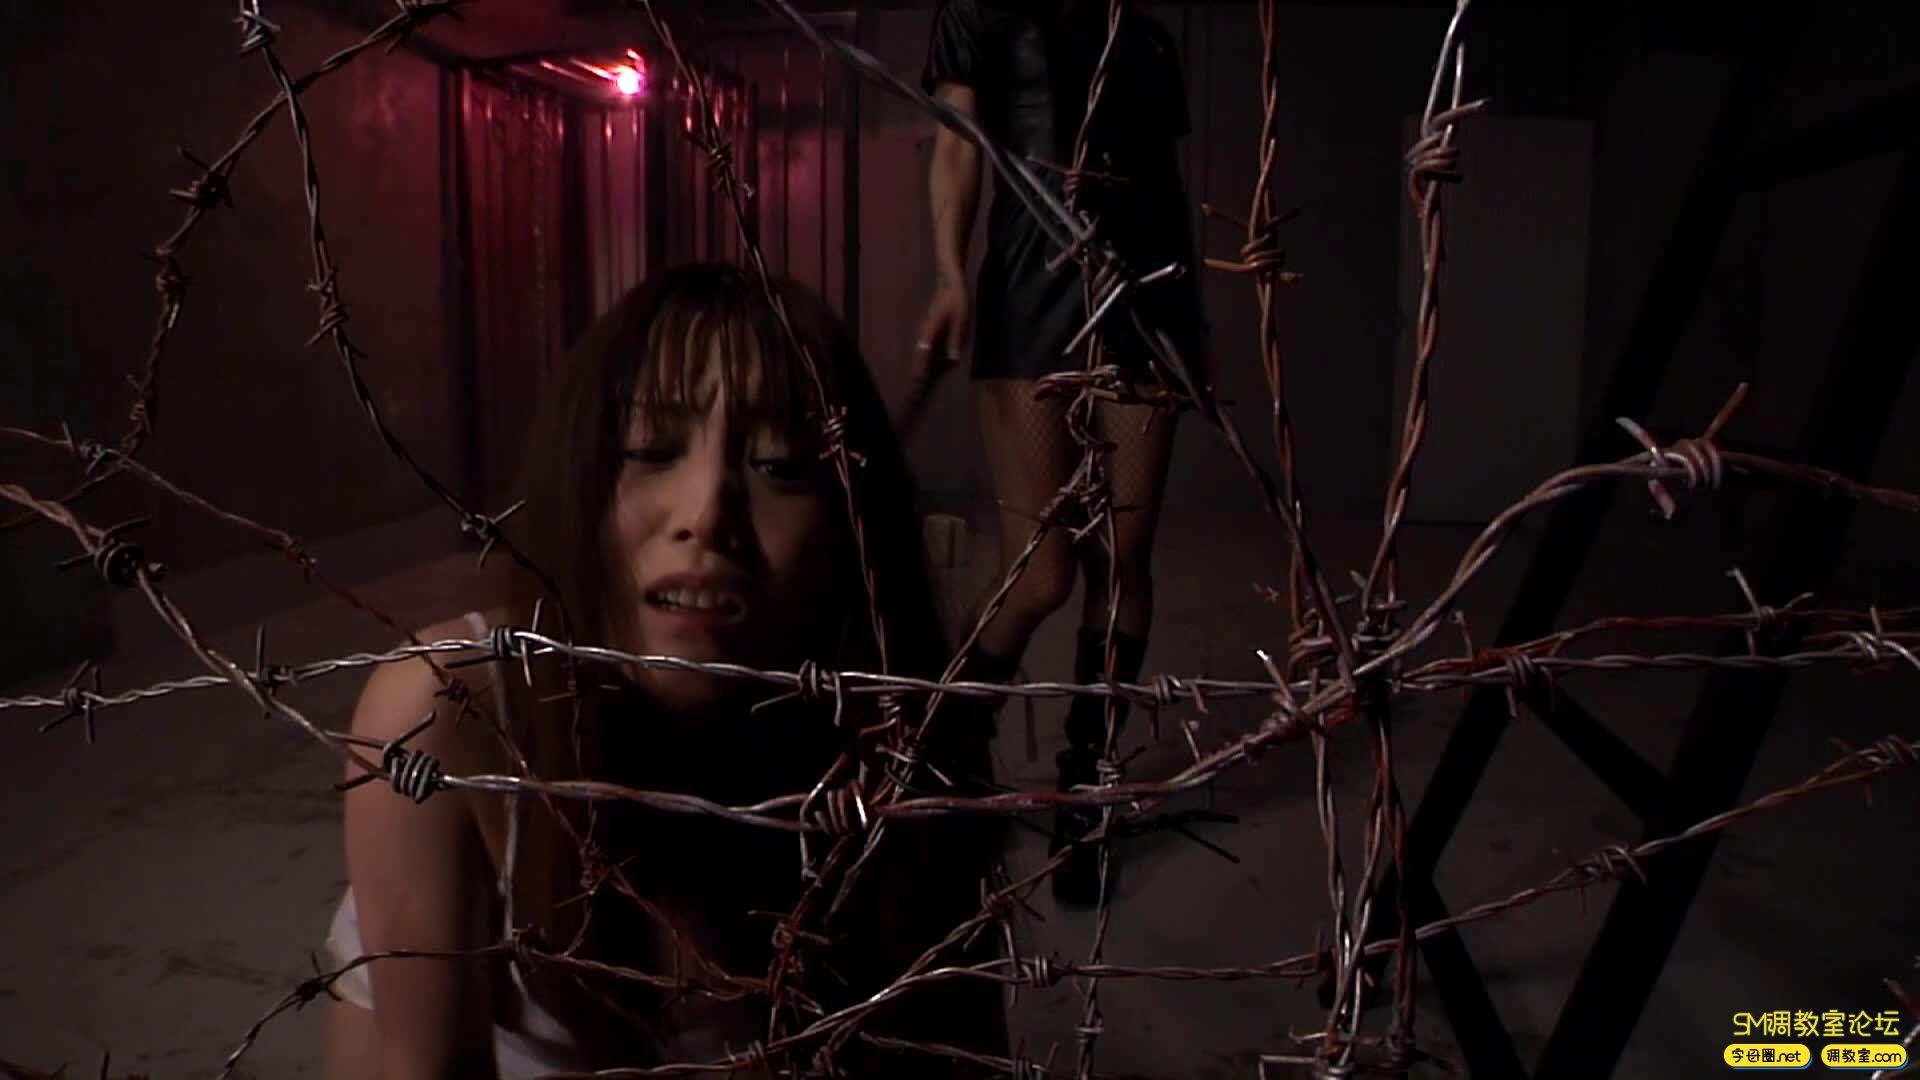 [Dogma合集] - NTJ-002 - 少女拷問ROOM 樹花凜-视频截图1